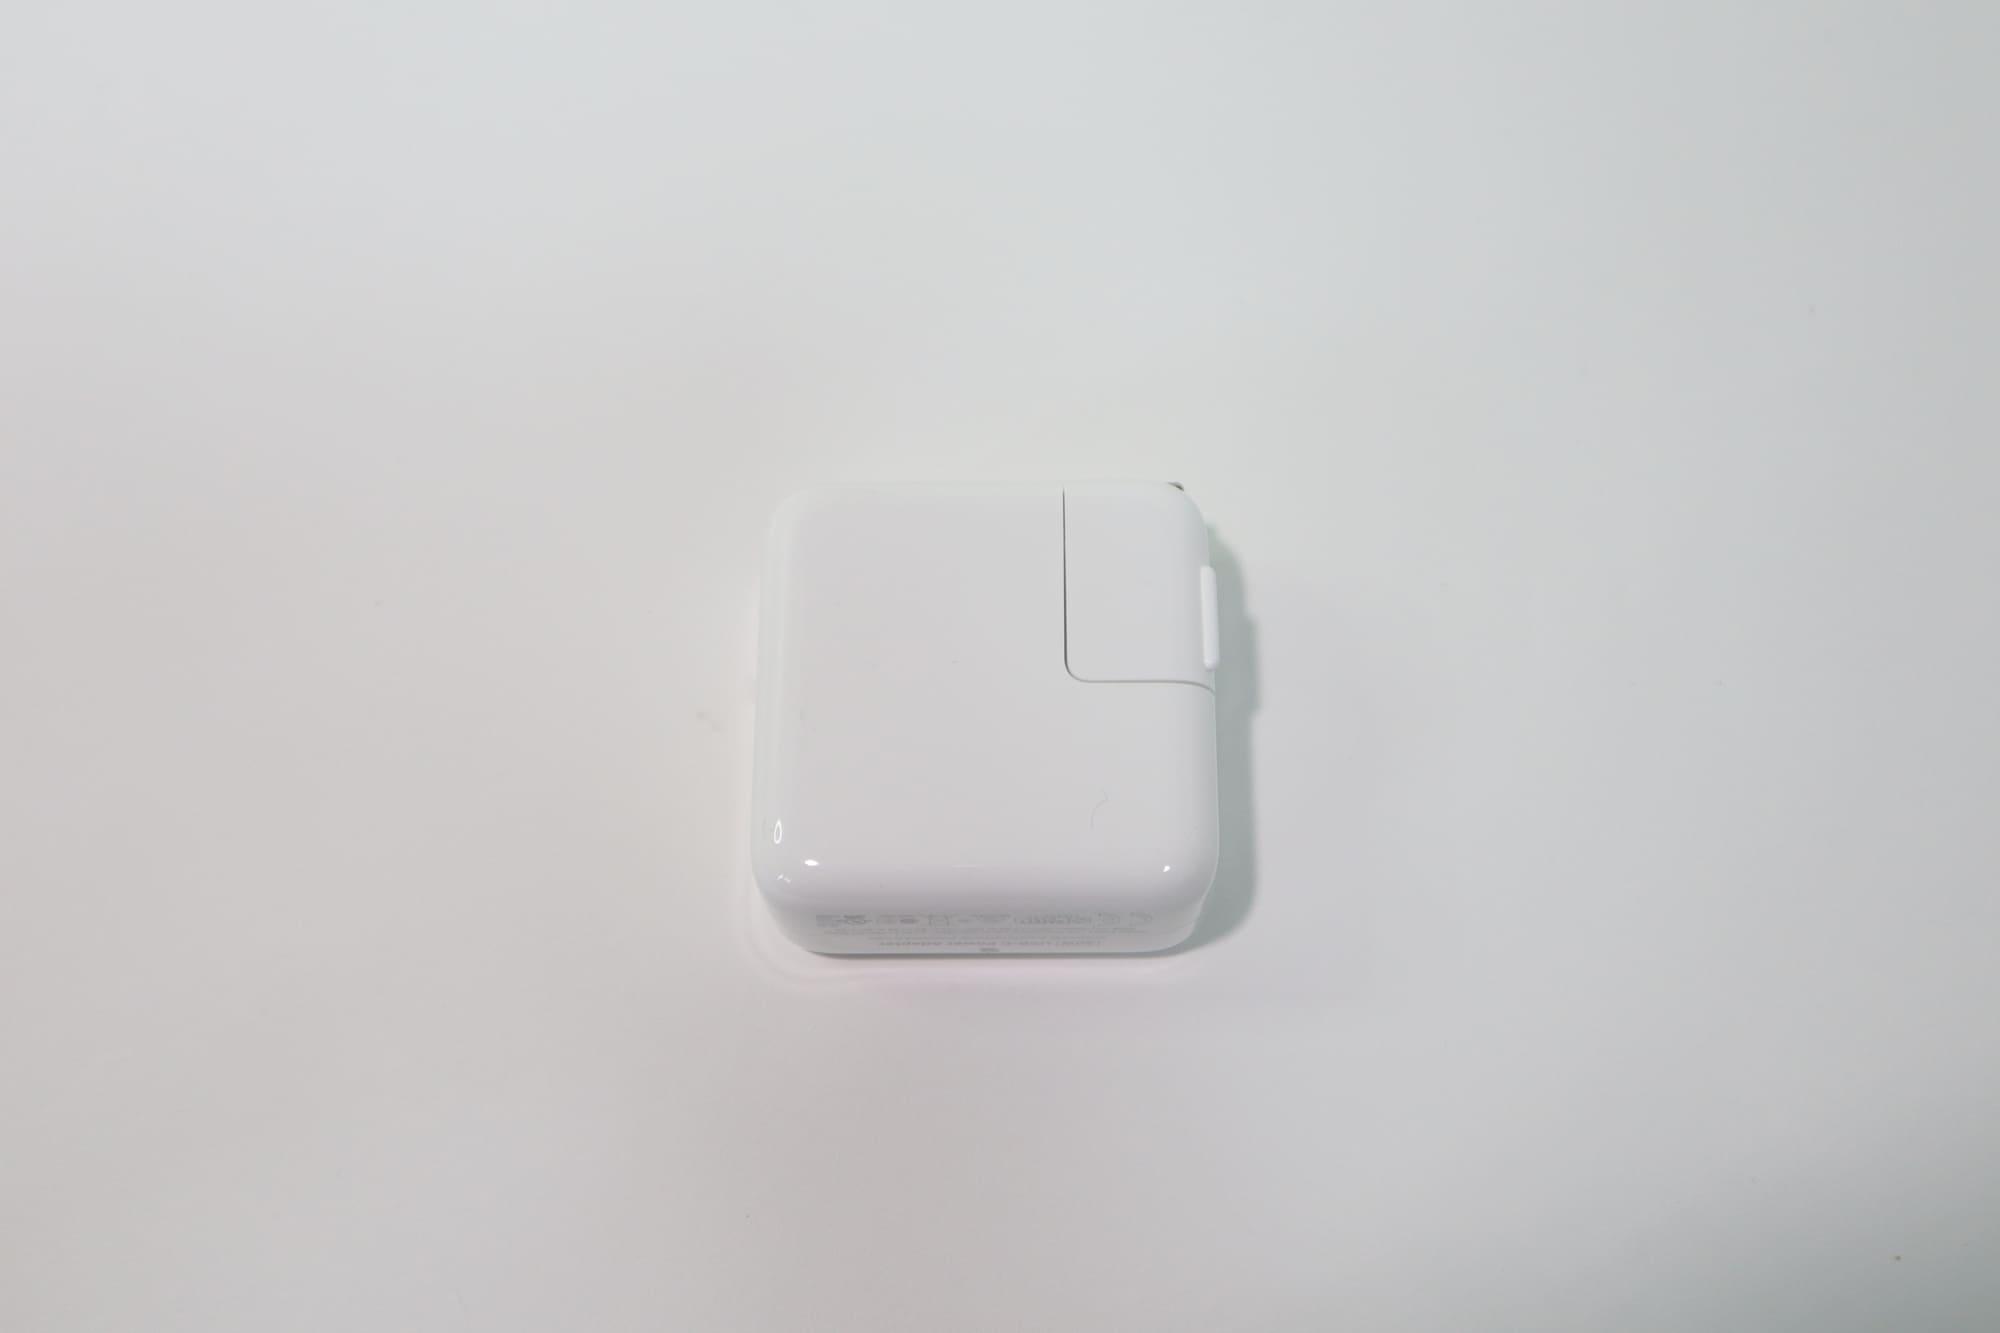 MacBook Air 2020の充電アダプタ